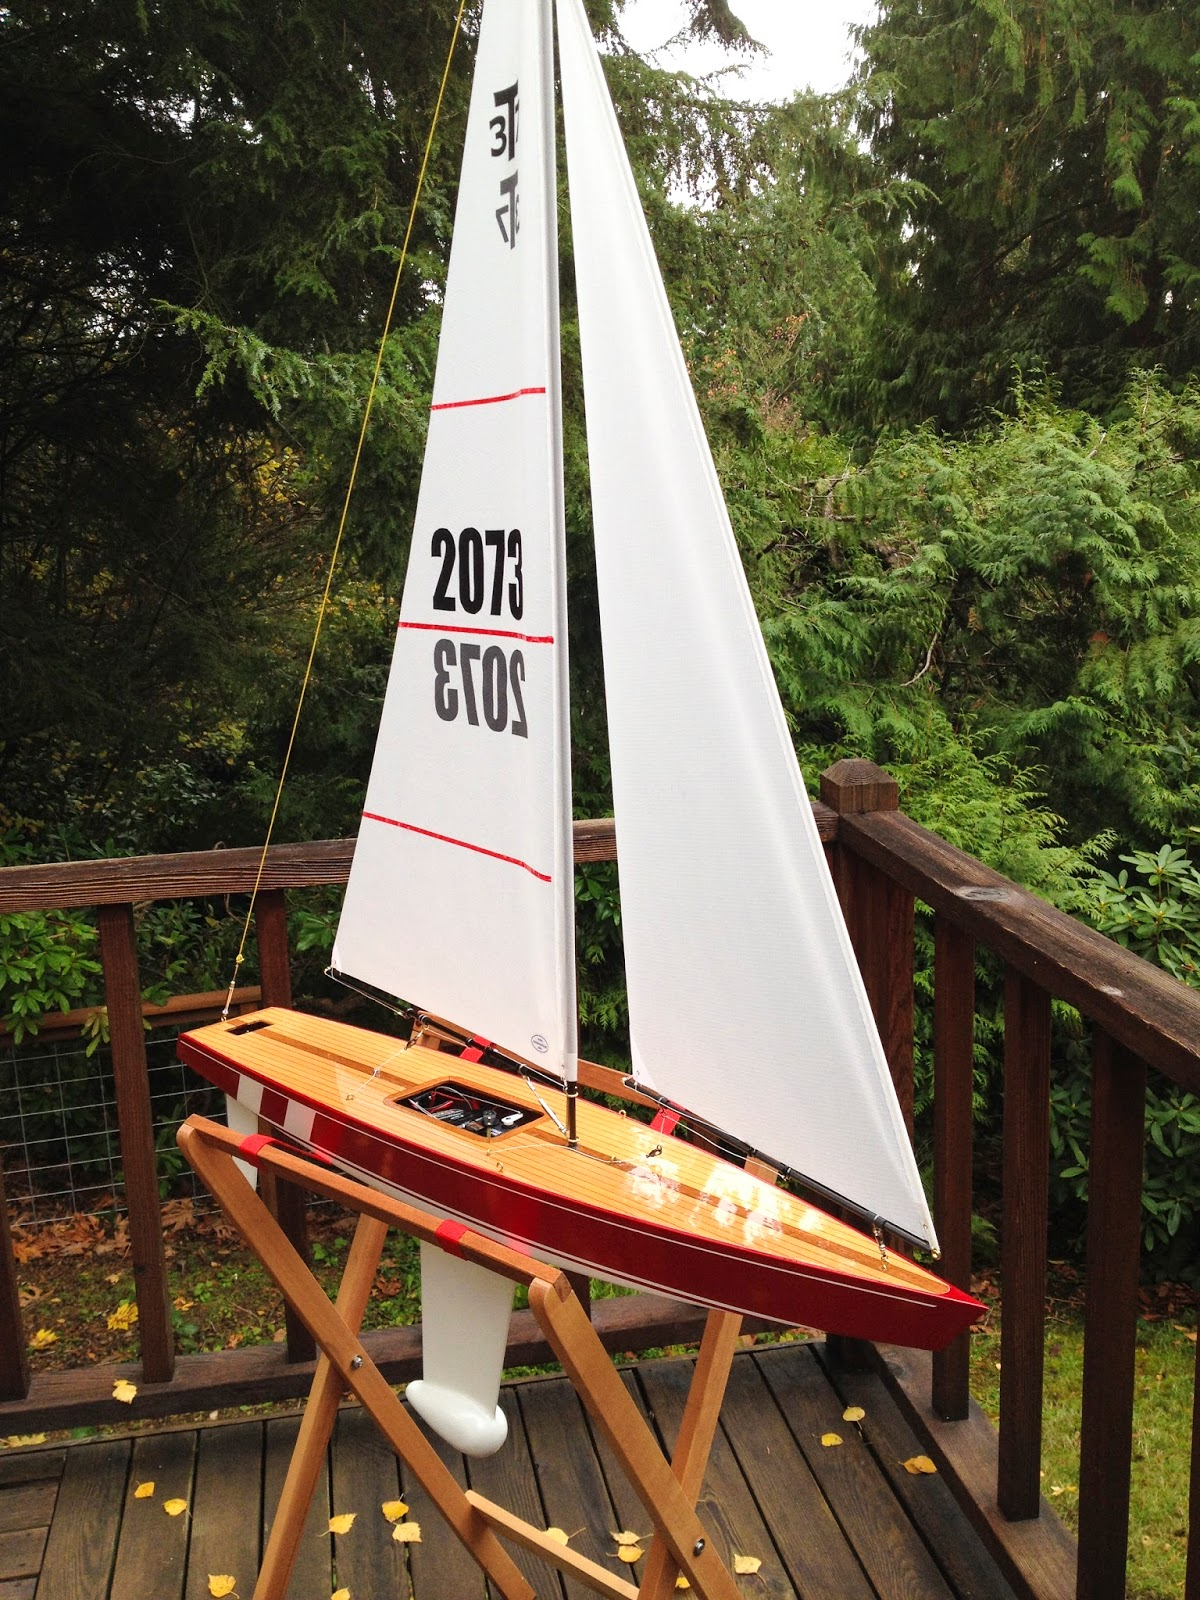 T37 RC Sailboat Blog